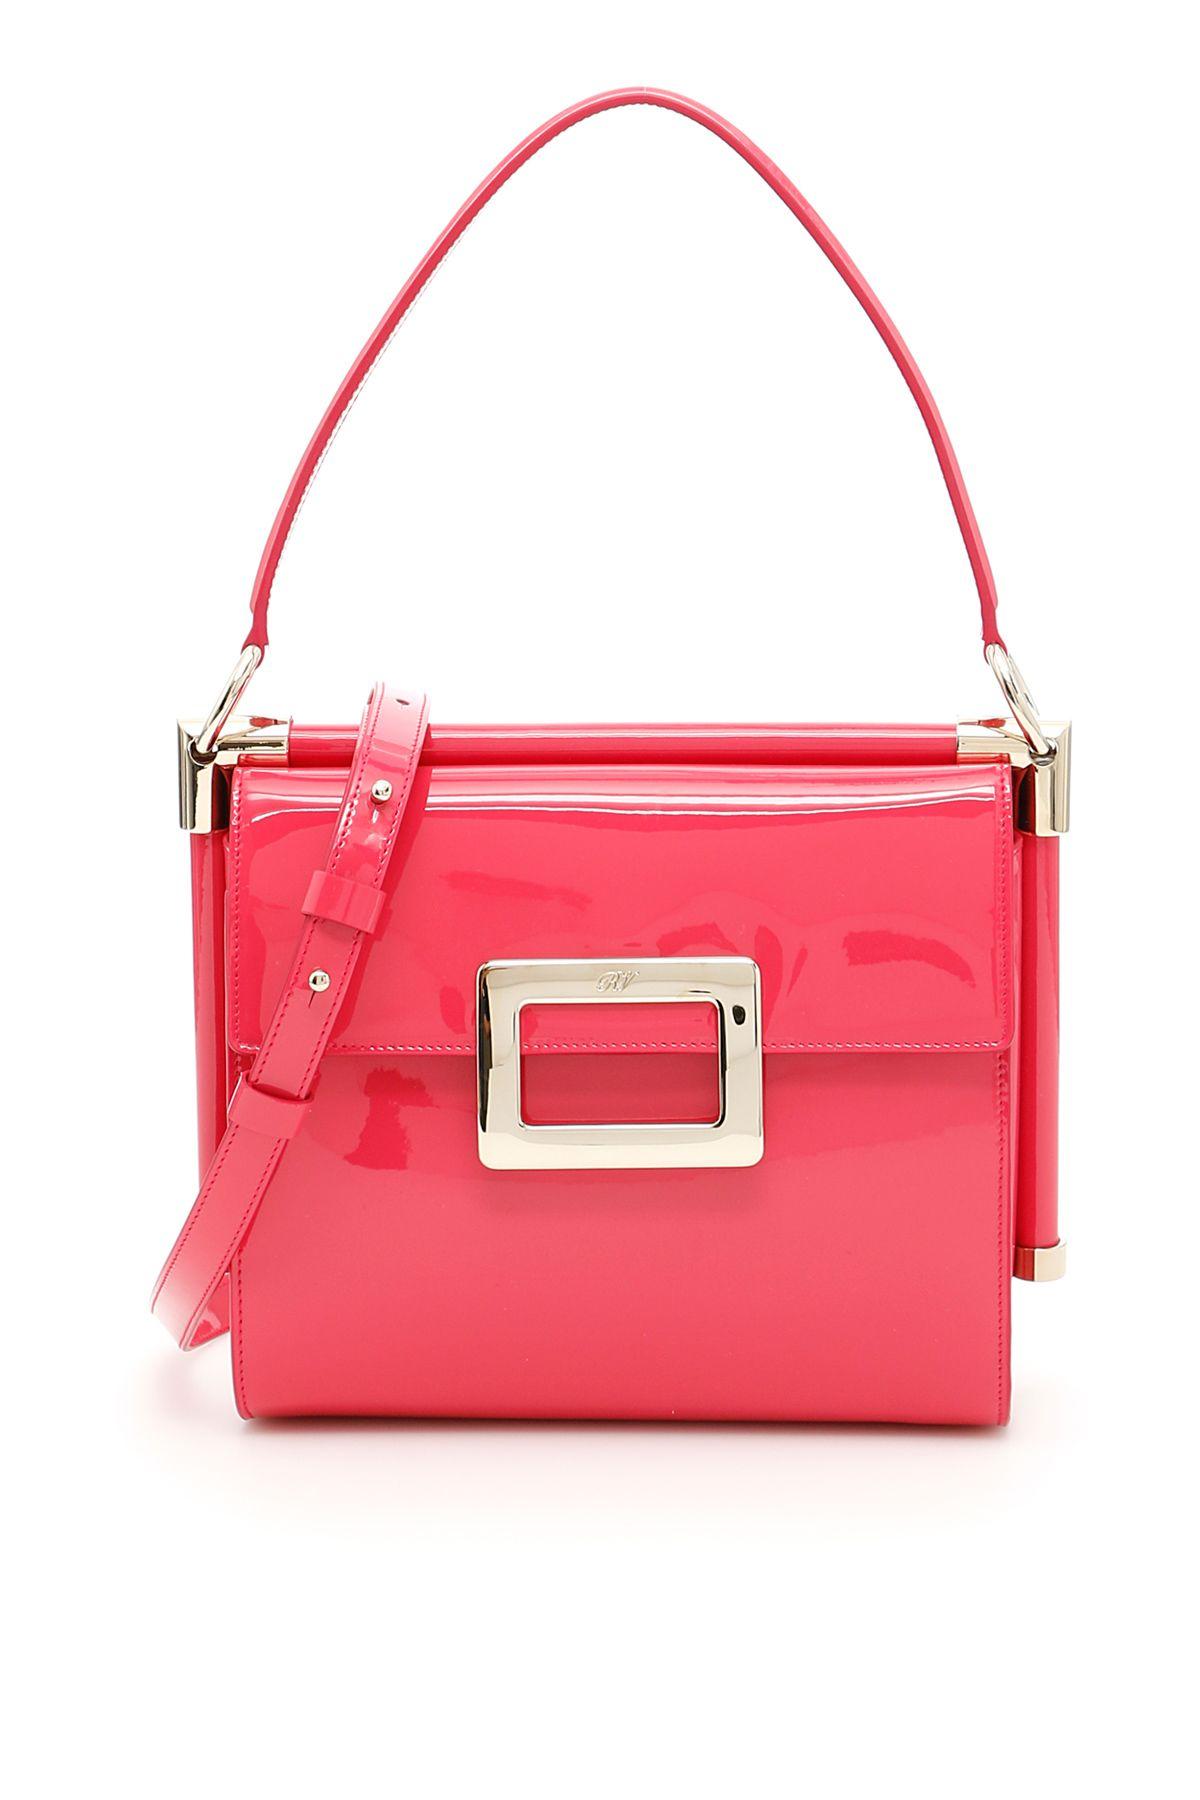 3d9b532a54cf Roger Vivier Miss Viv Carré Small Bag - ROSA ALTEA